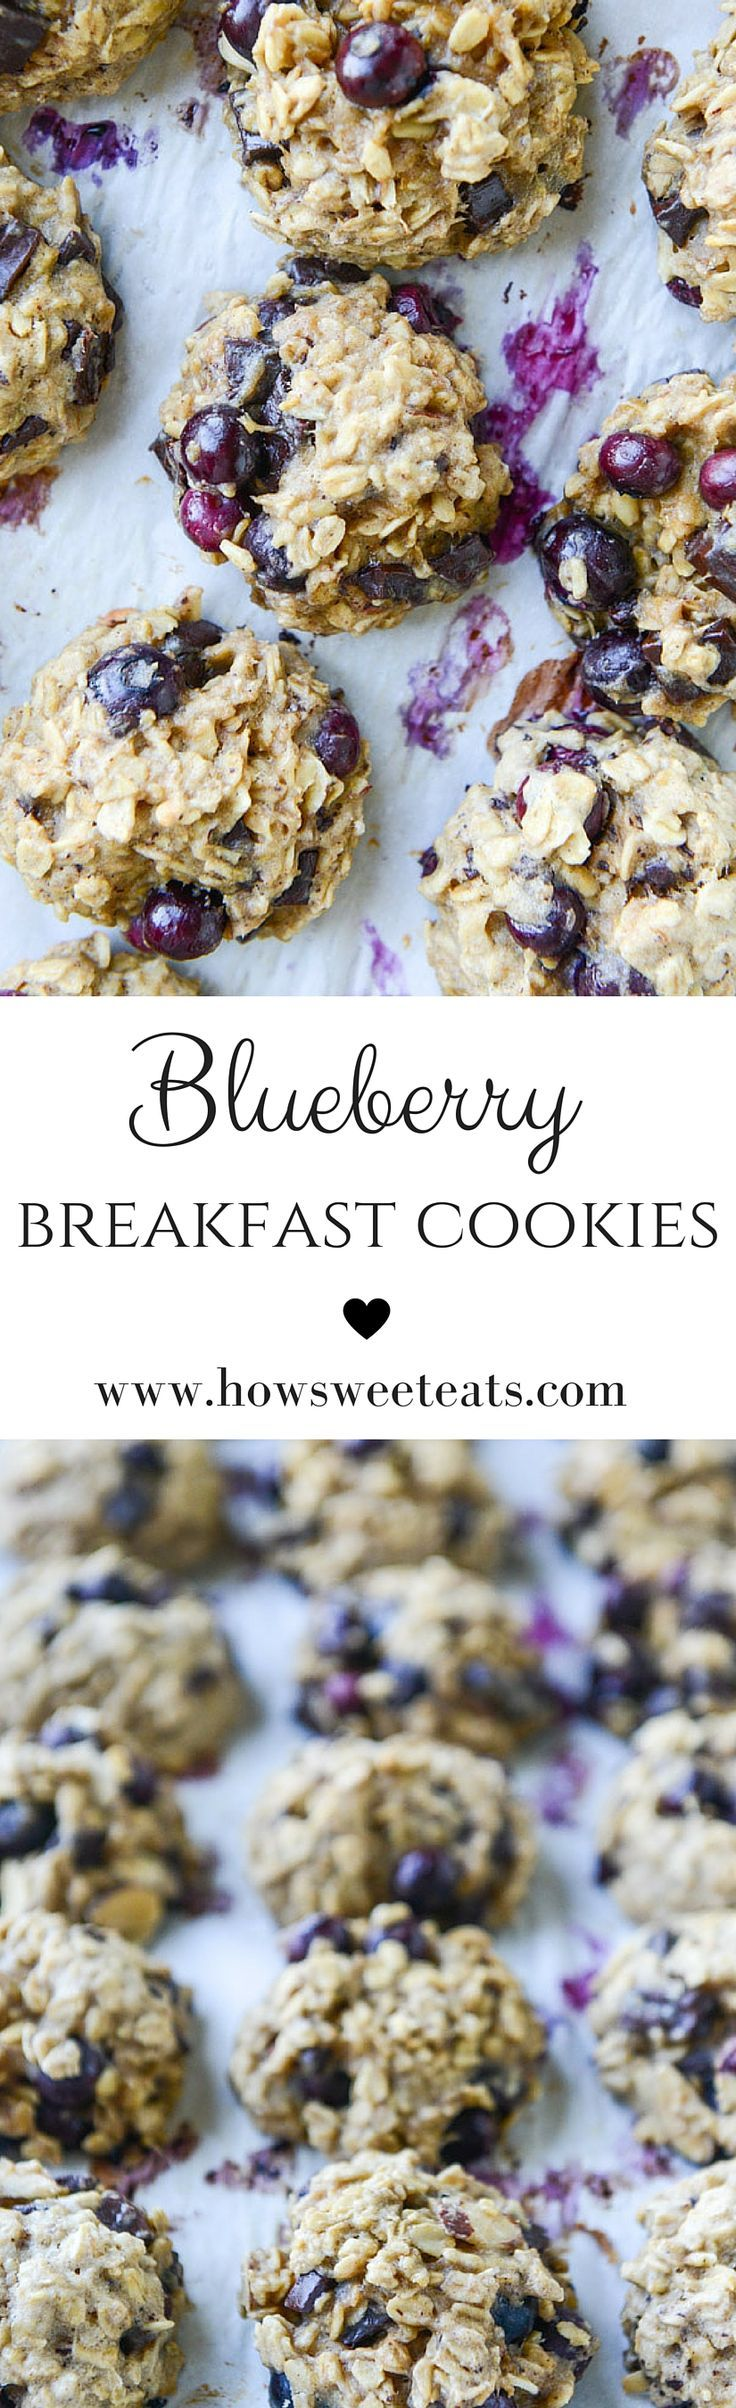 Blueberry Breakfast Cookies by @howsweeteats I howsweeteats.com